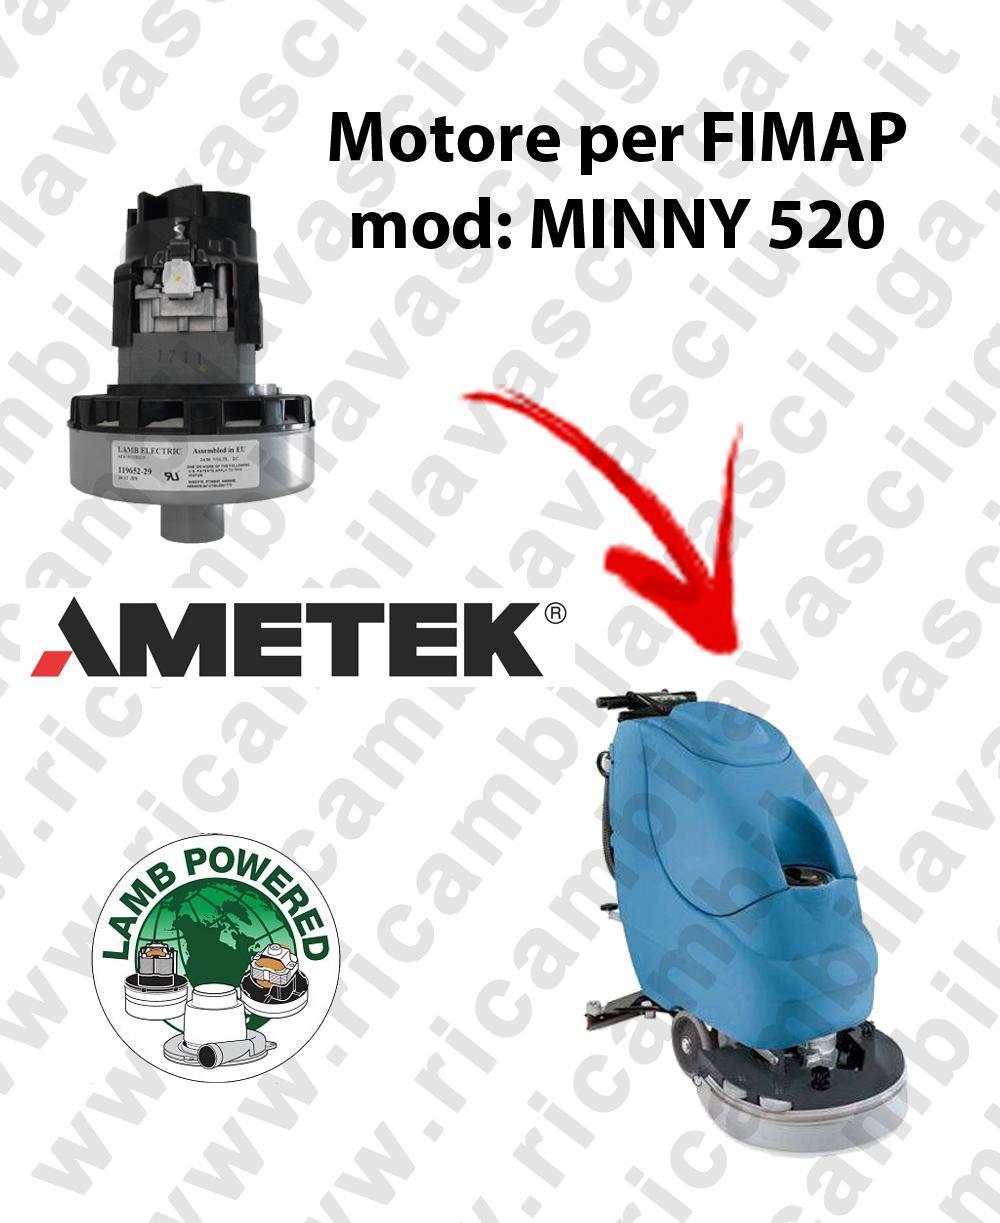 MYNNY 520 Motore de aspiración LAMB AMETEK para fregadora FIMAP